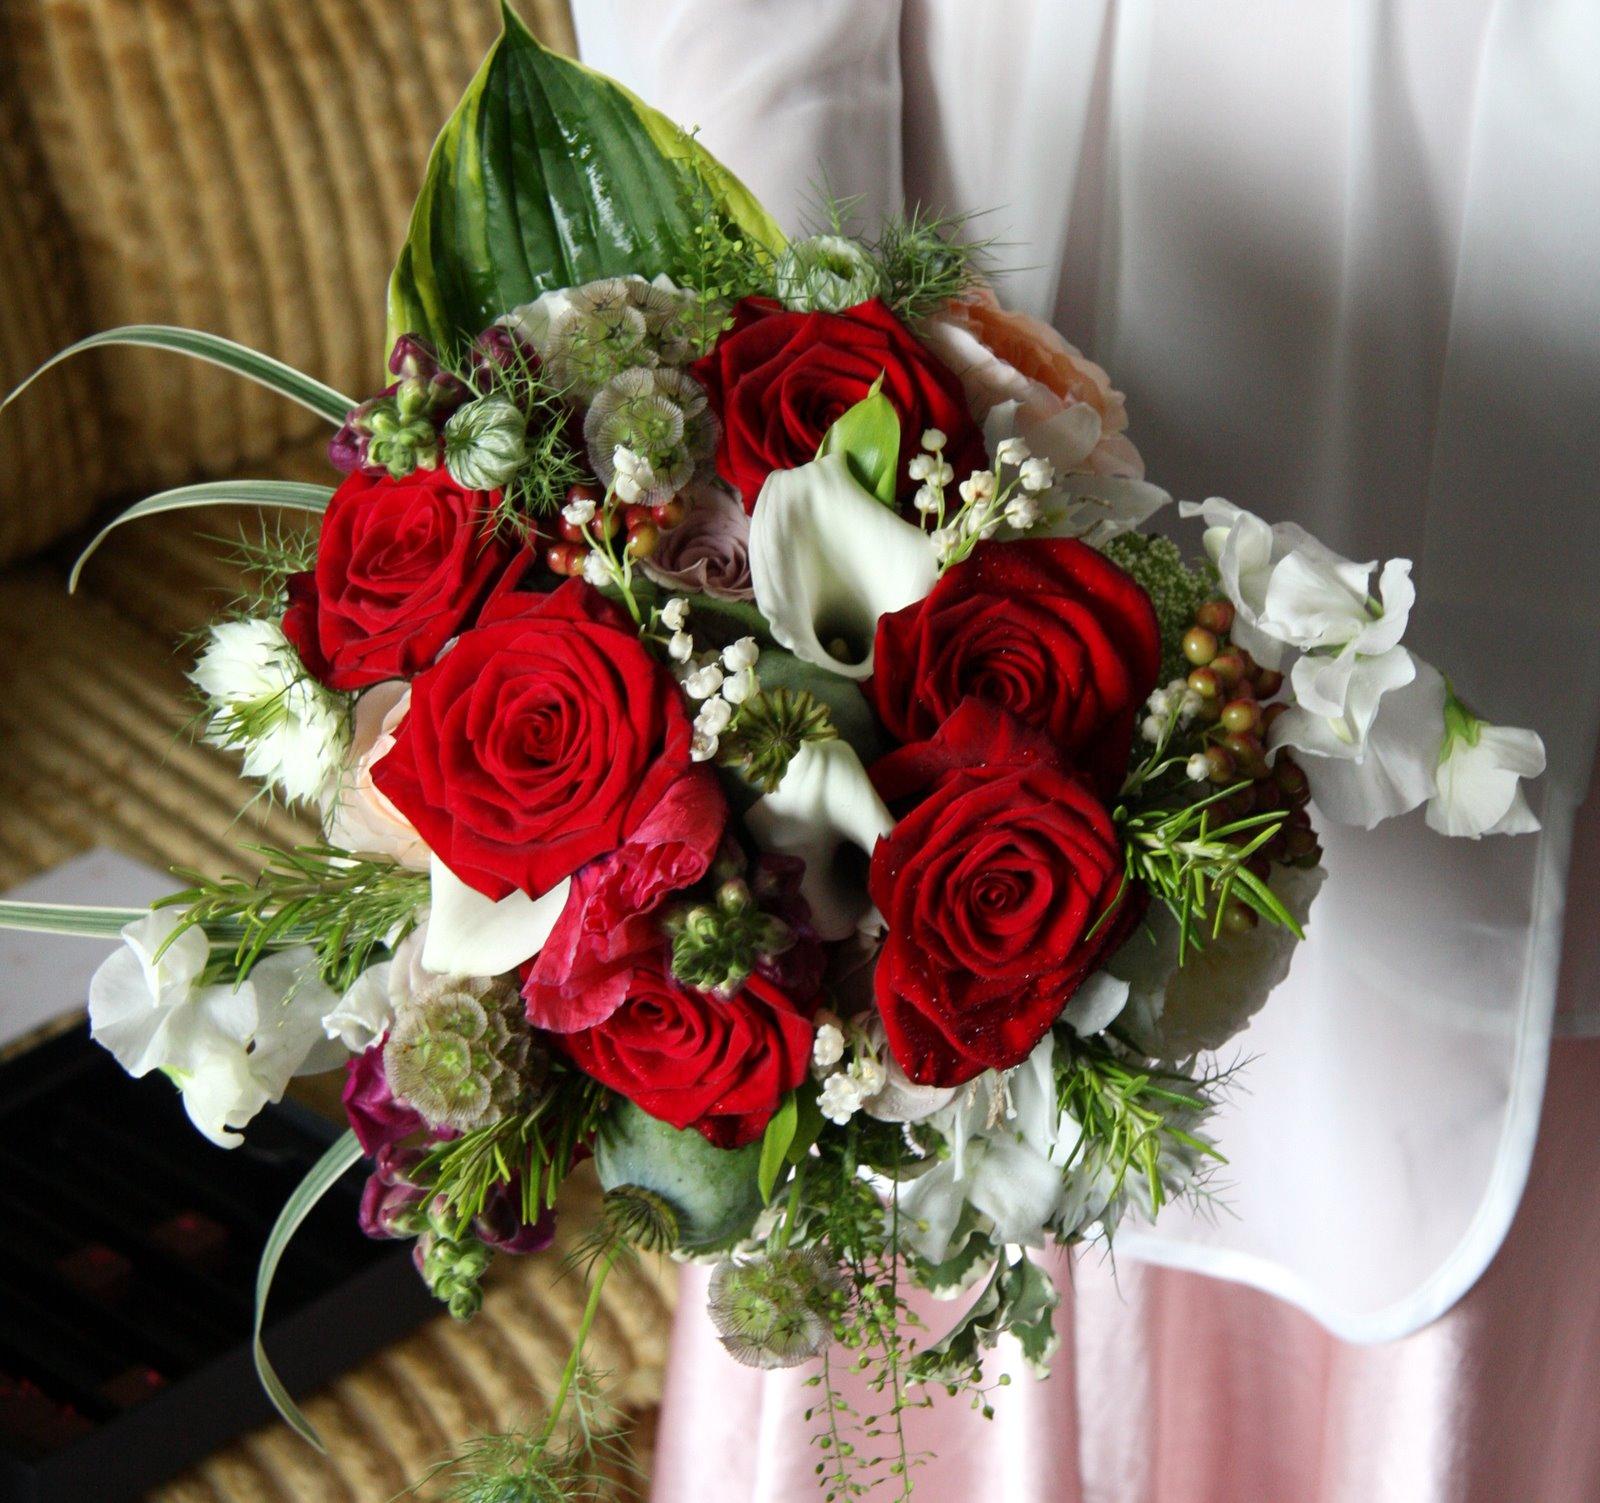 Romantic Red Rose Wedding Flowers